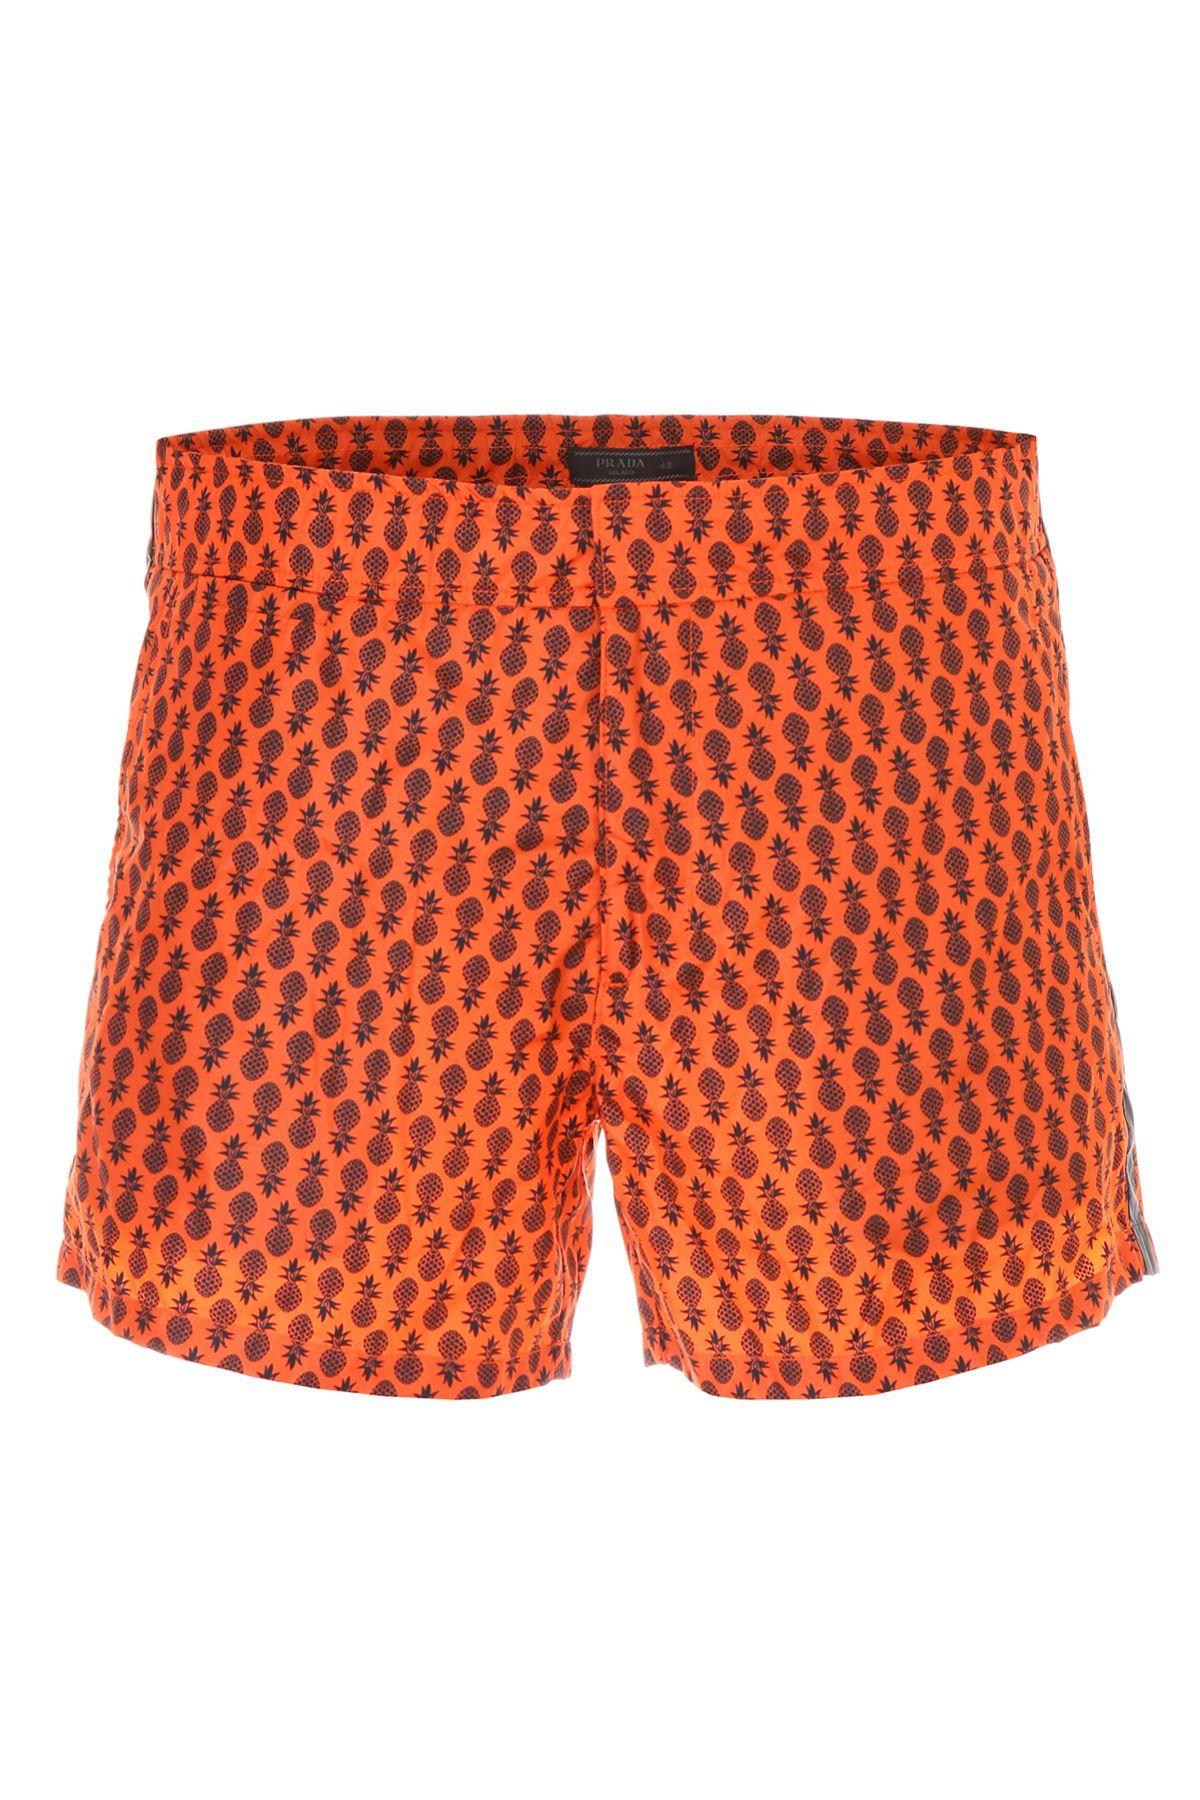 bdc87ff37c9ee Prada Linea Rossa Tropical Nylon Swim Shorts - ARANCIO+NERO (Orange) ...